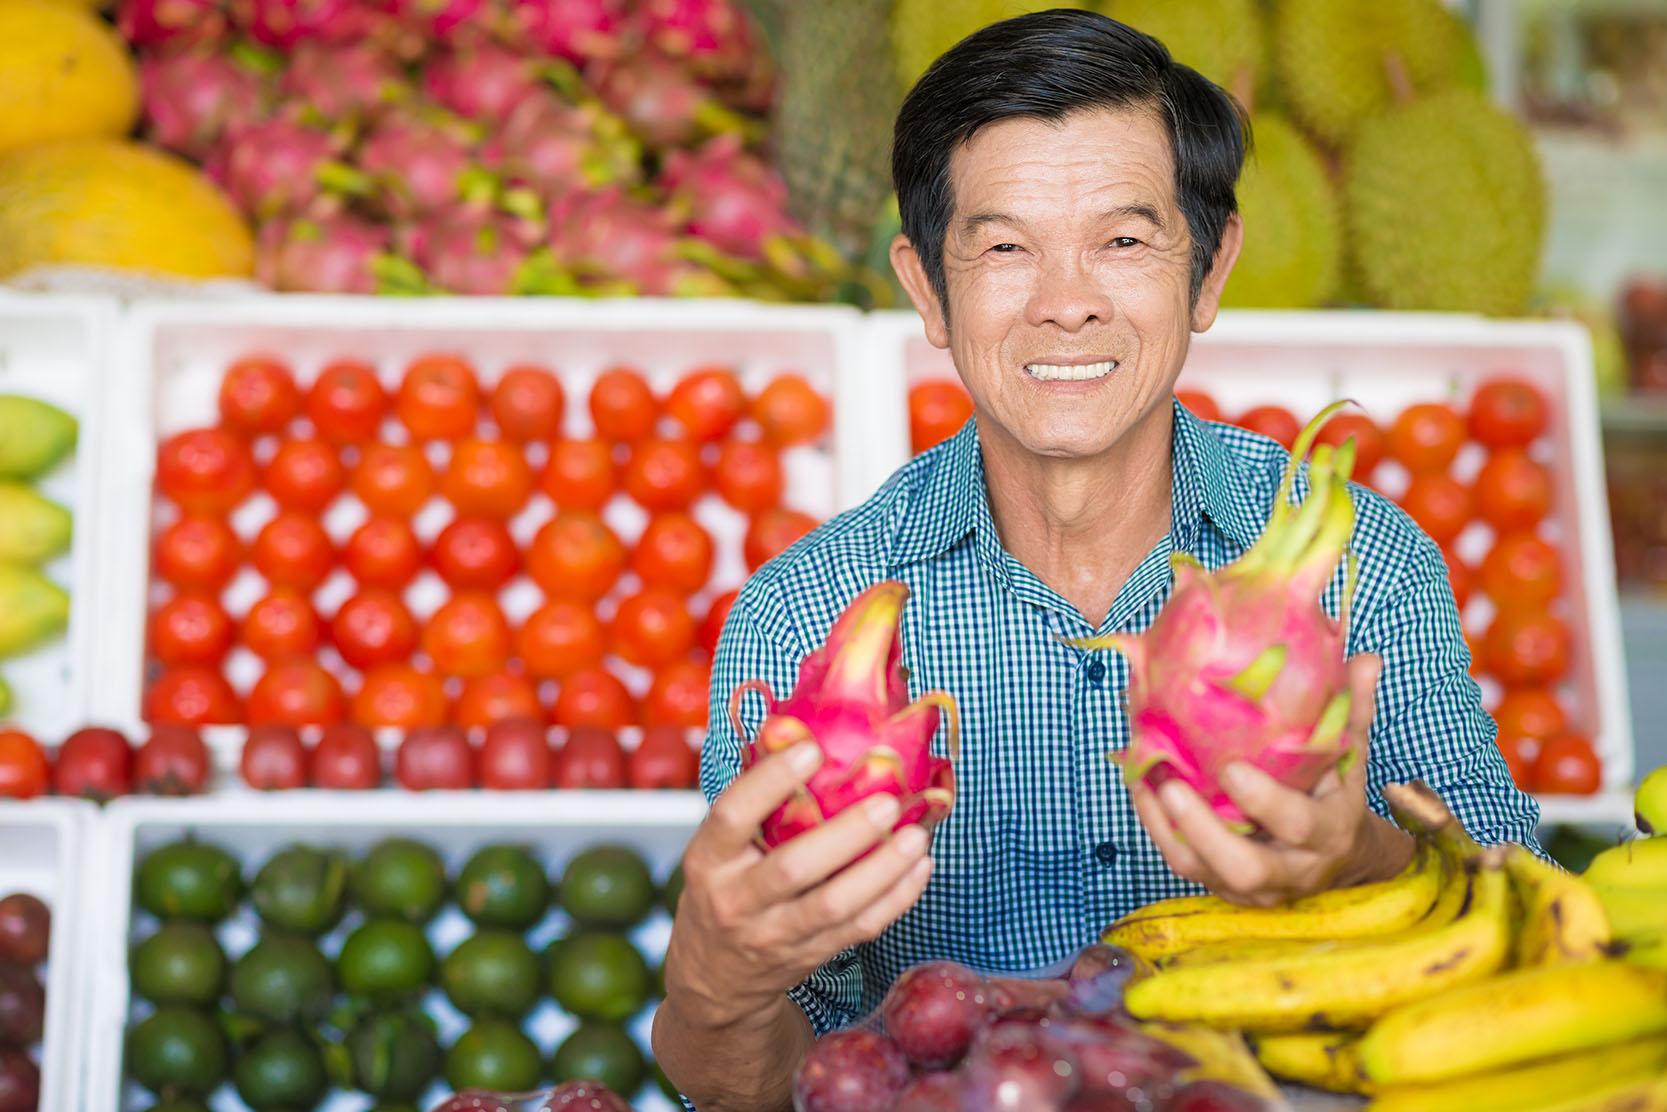 Keuthmann Frische, Exoten, Drachenfrucht